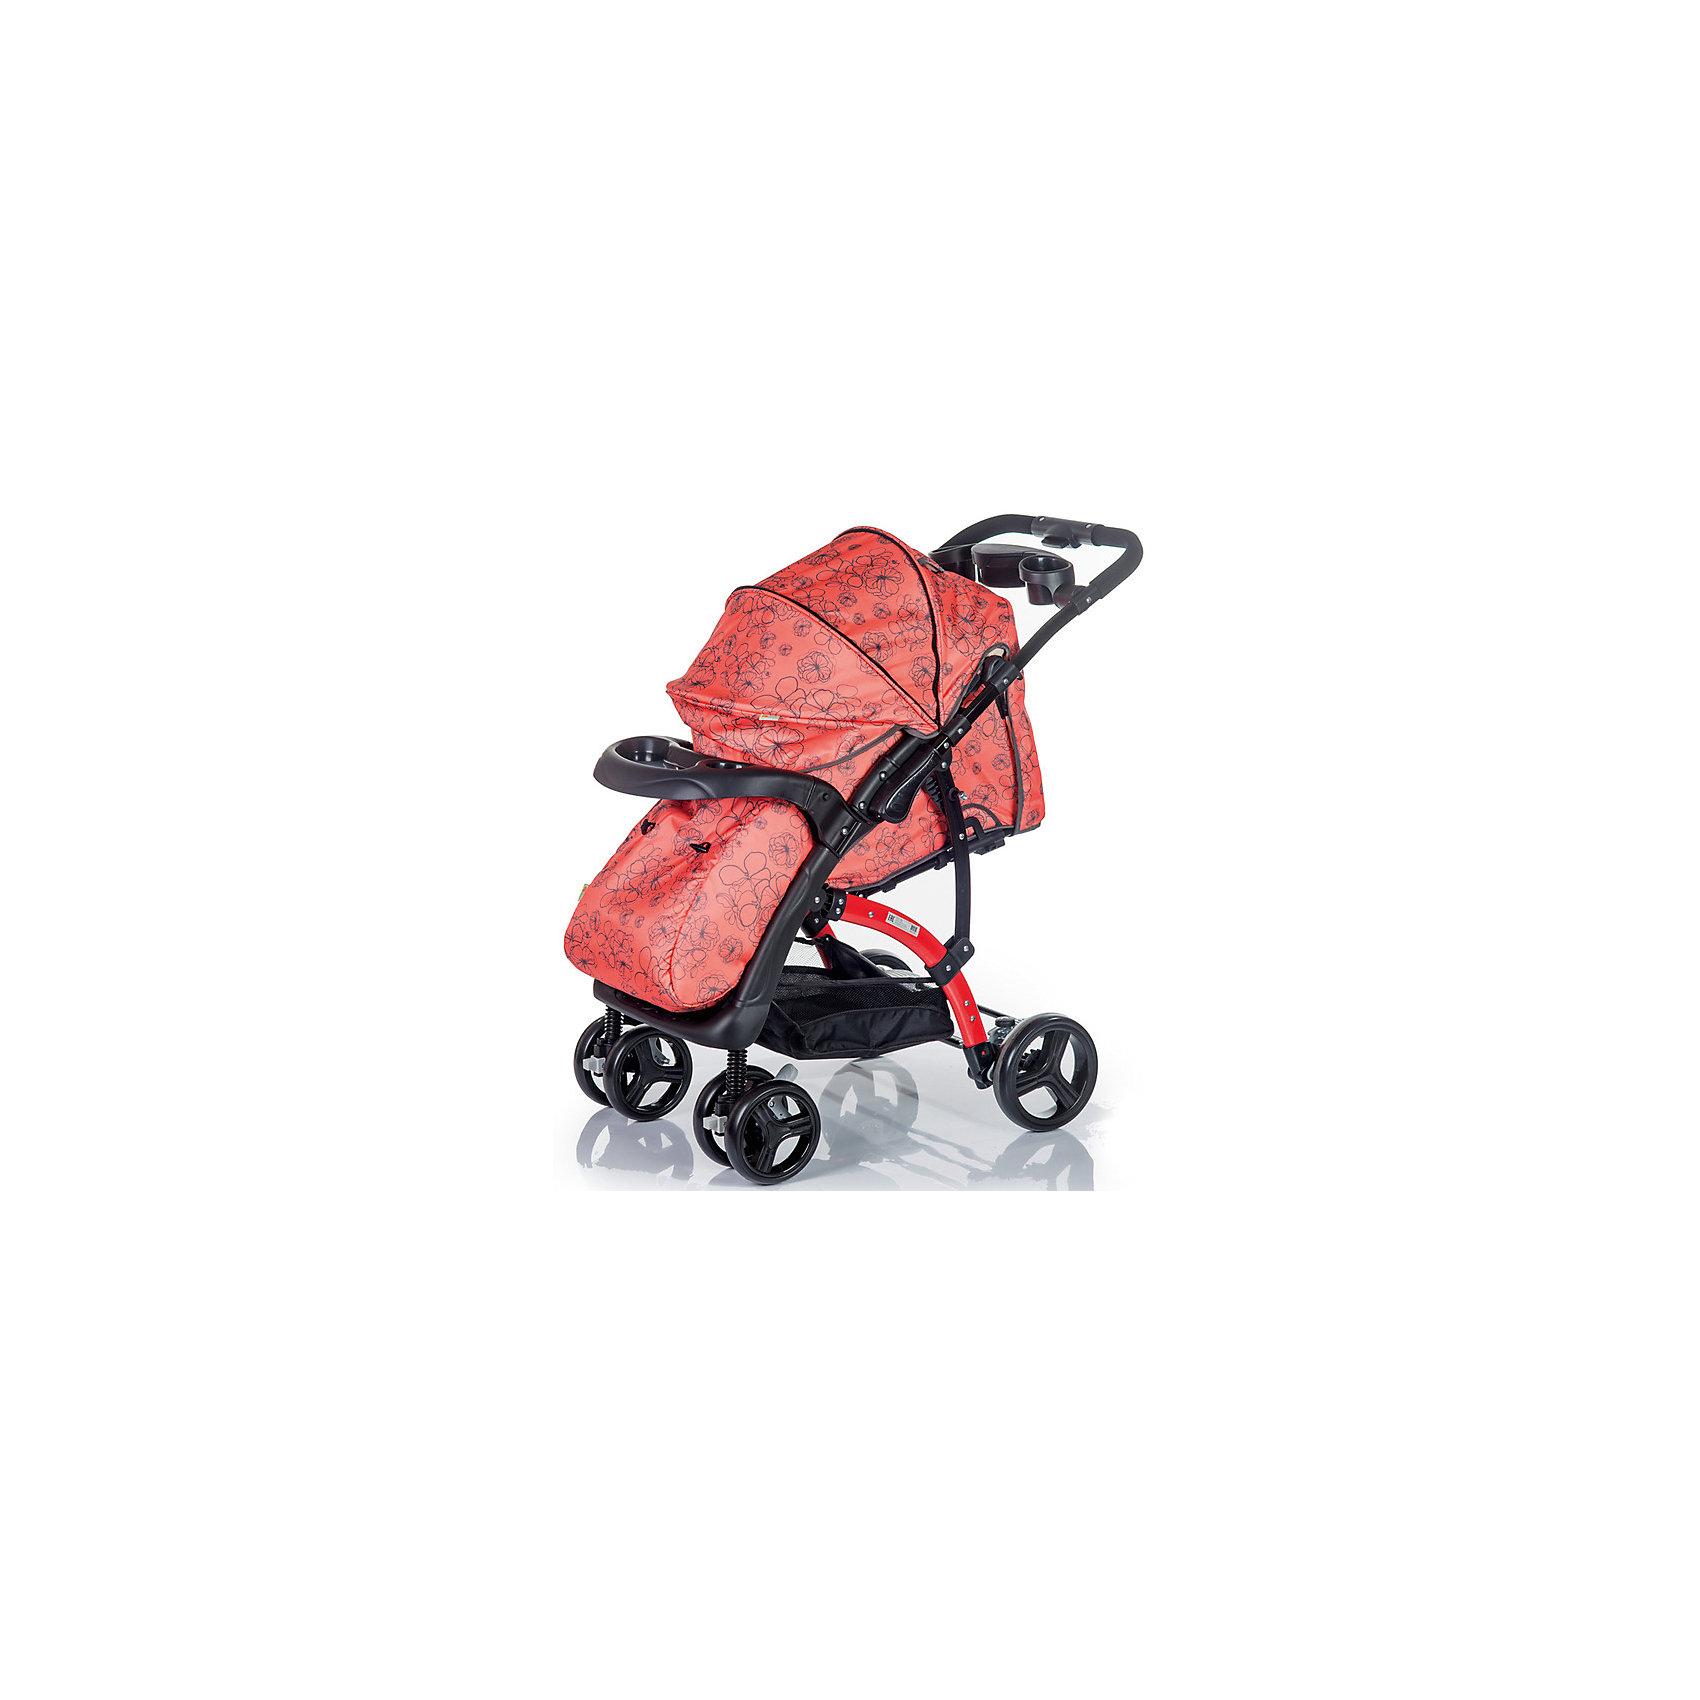 Baby Hit Прогулочная коляска FLORA, Babyhit, коралловый/серый прогулочные коляски babyhit drive